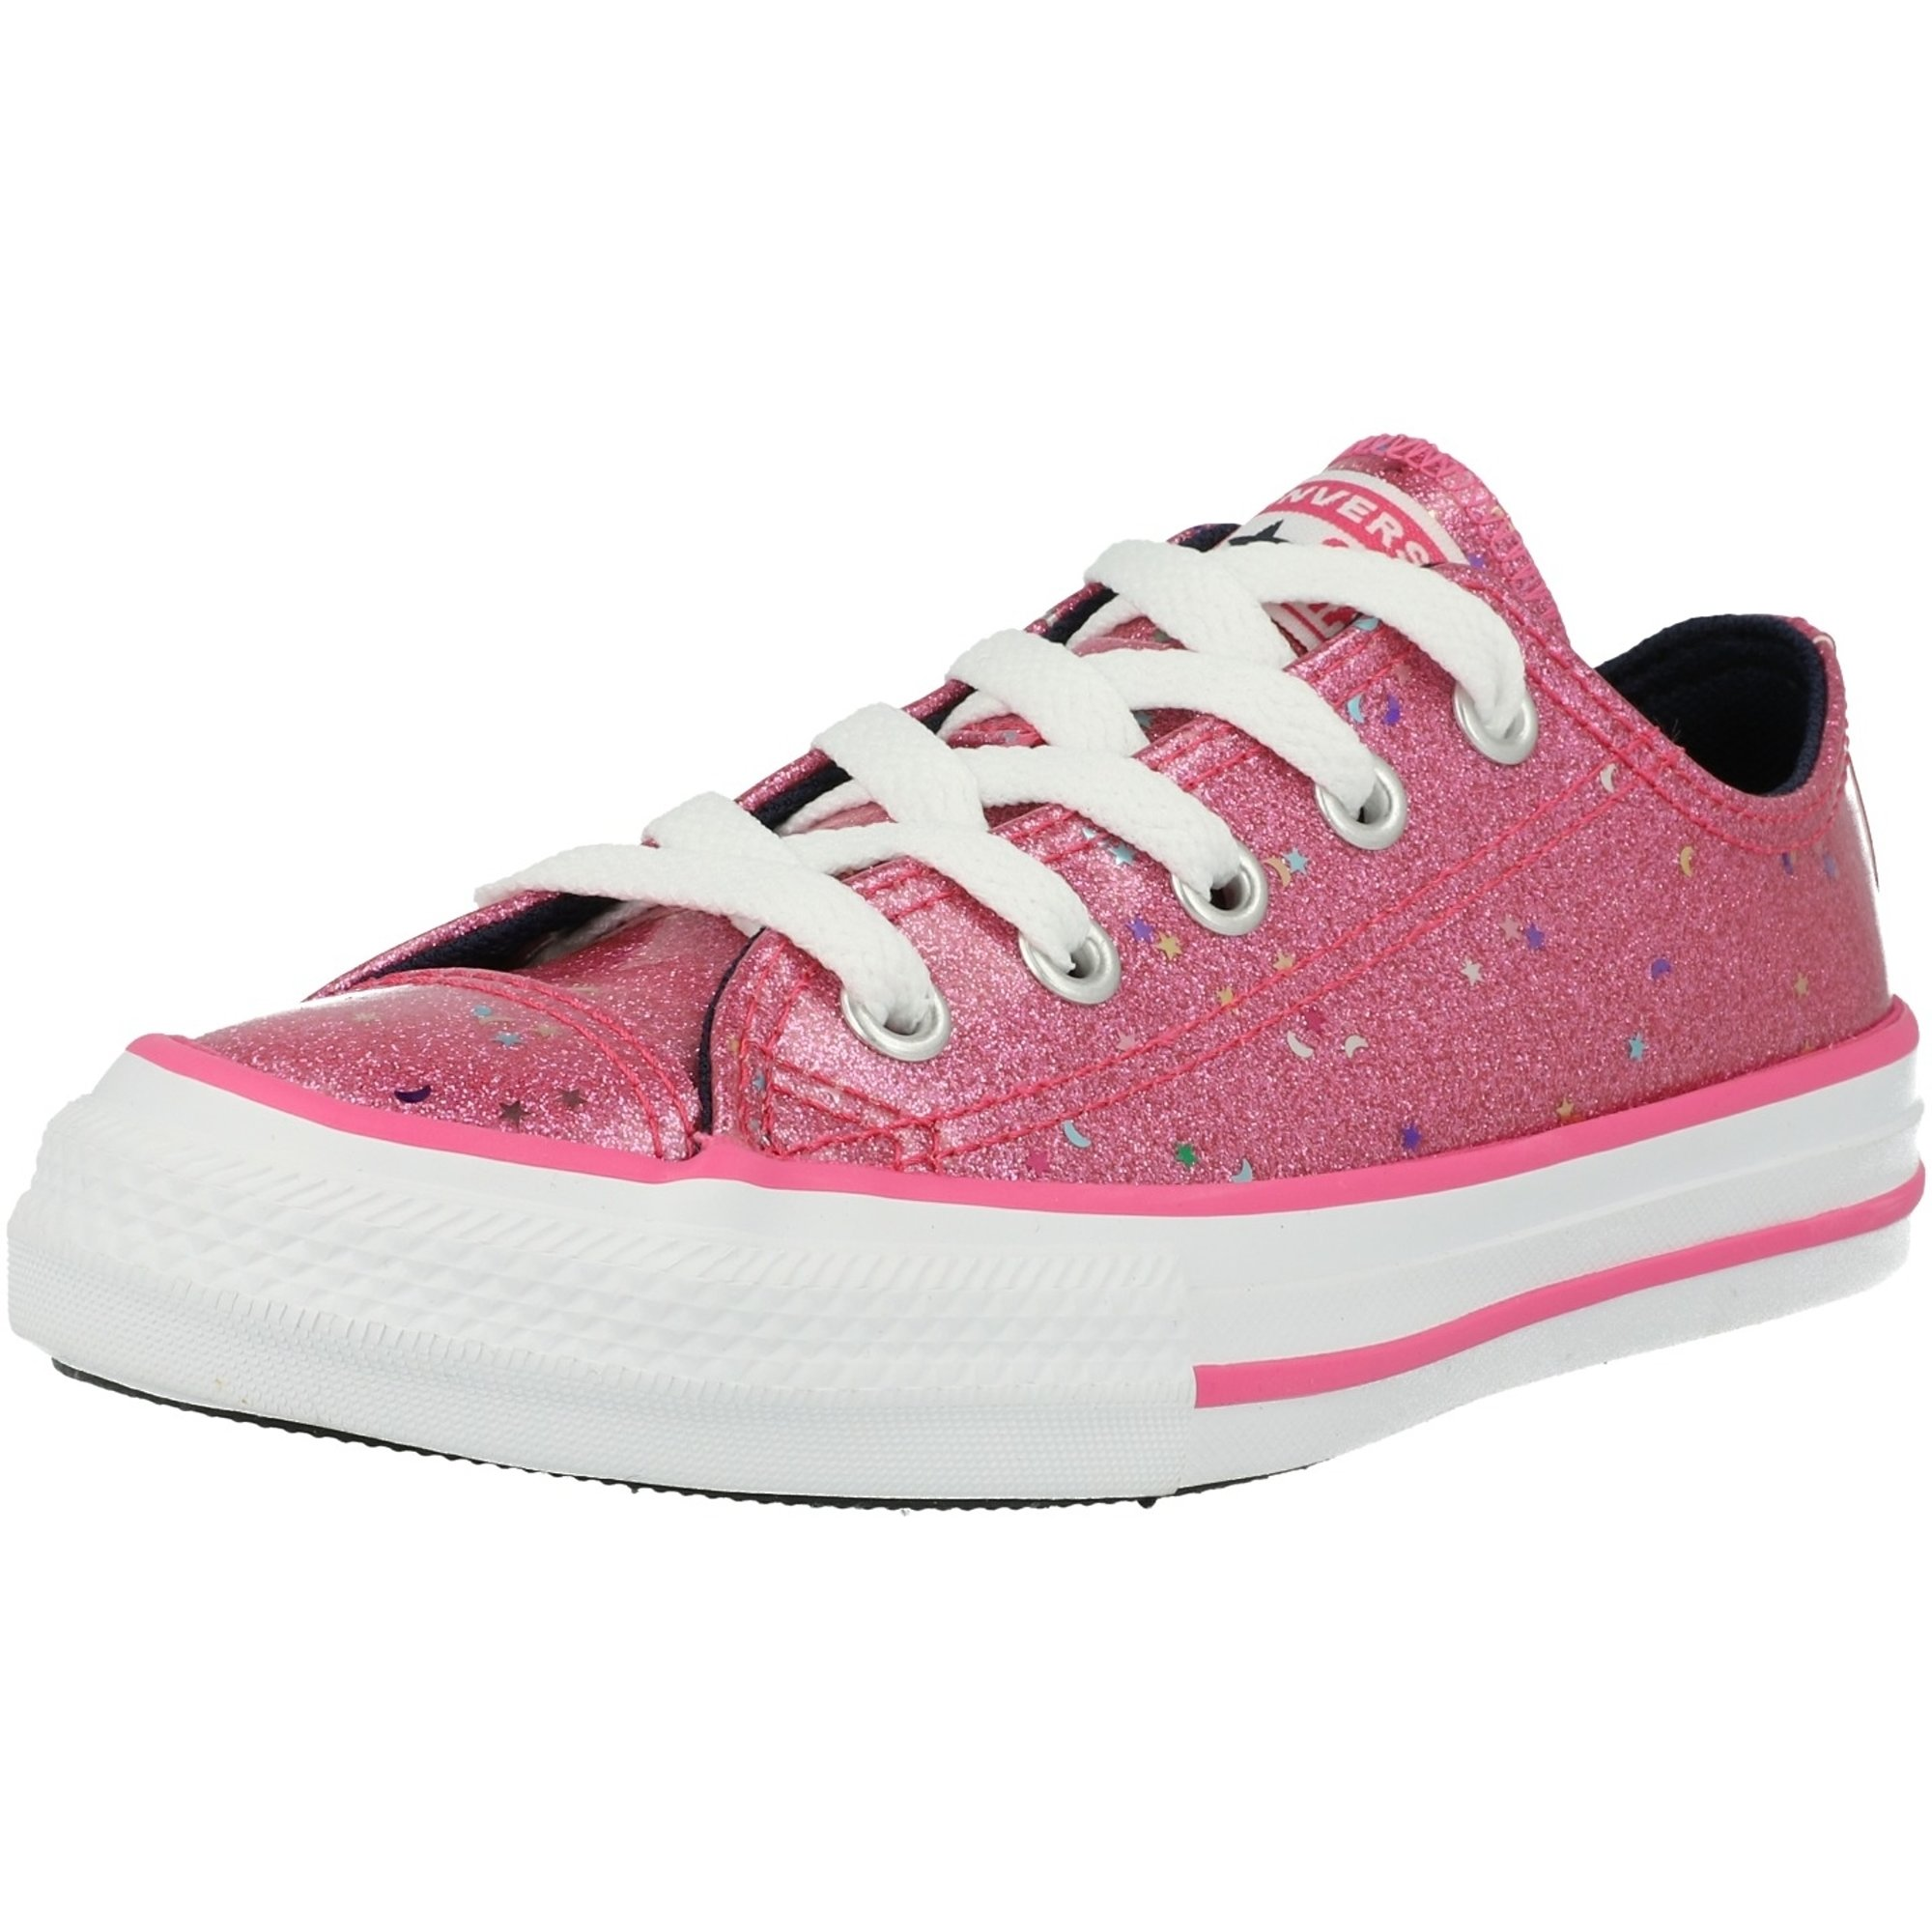 Converse Chuck Taylor All Star Galaxy Glimmer Ox Mod Pink Synthetik Jugend